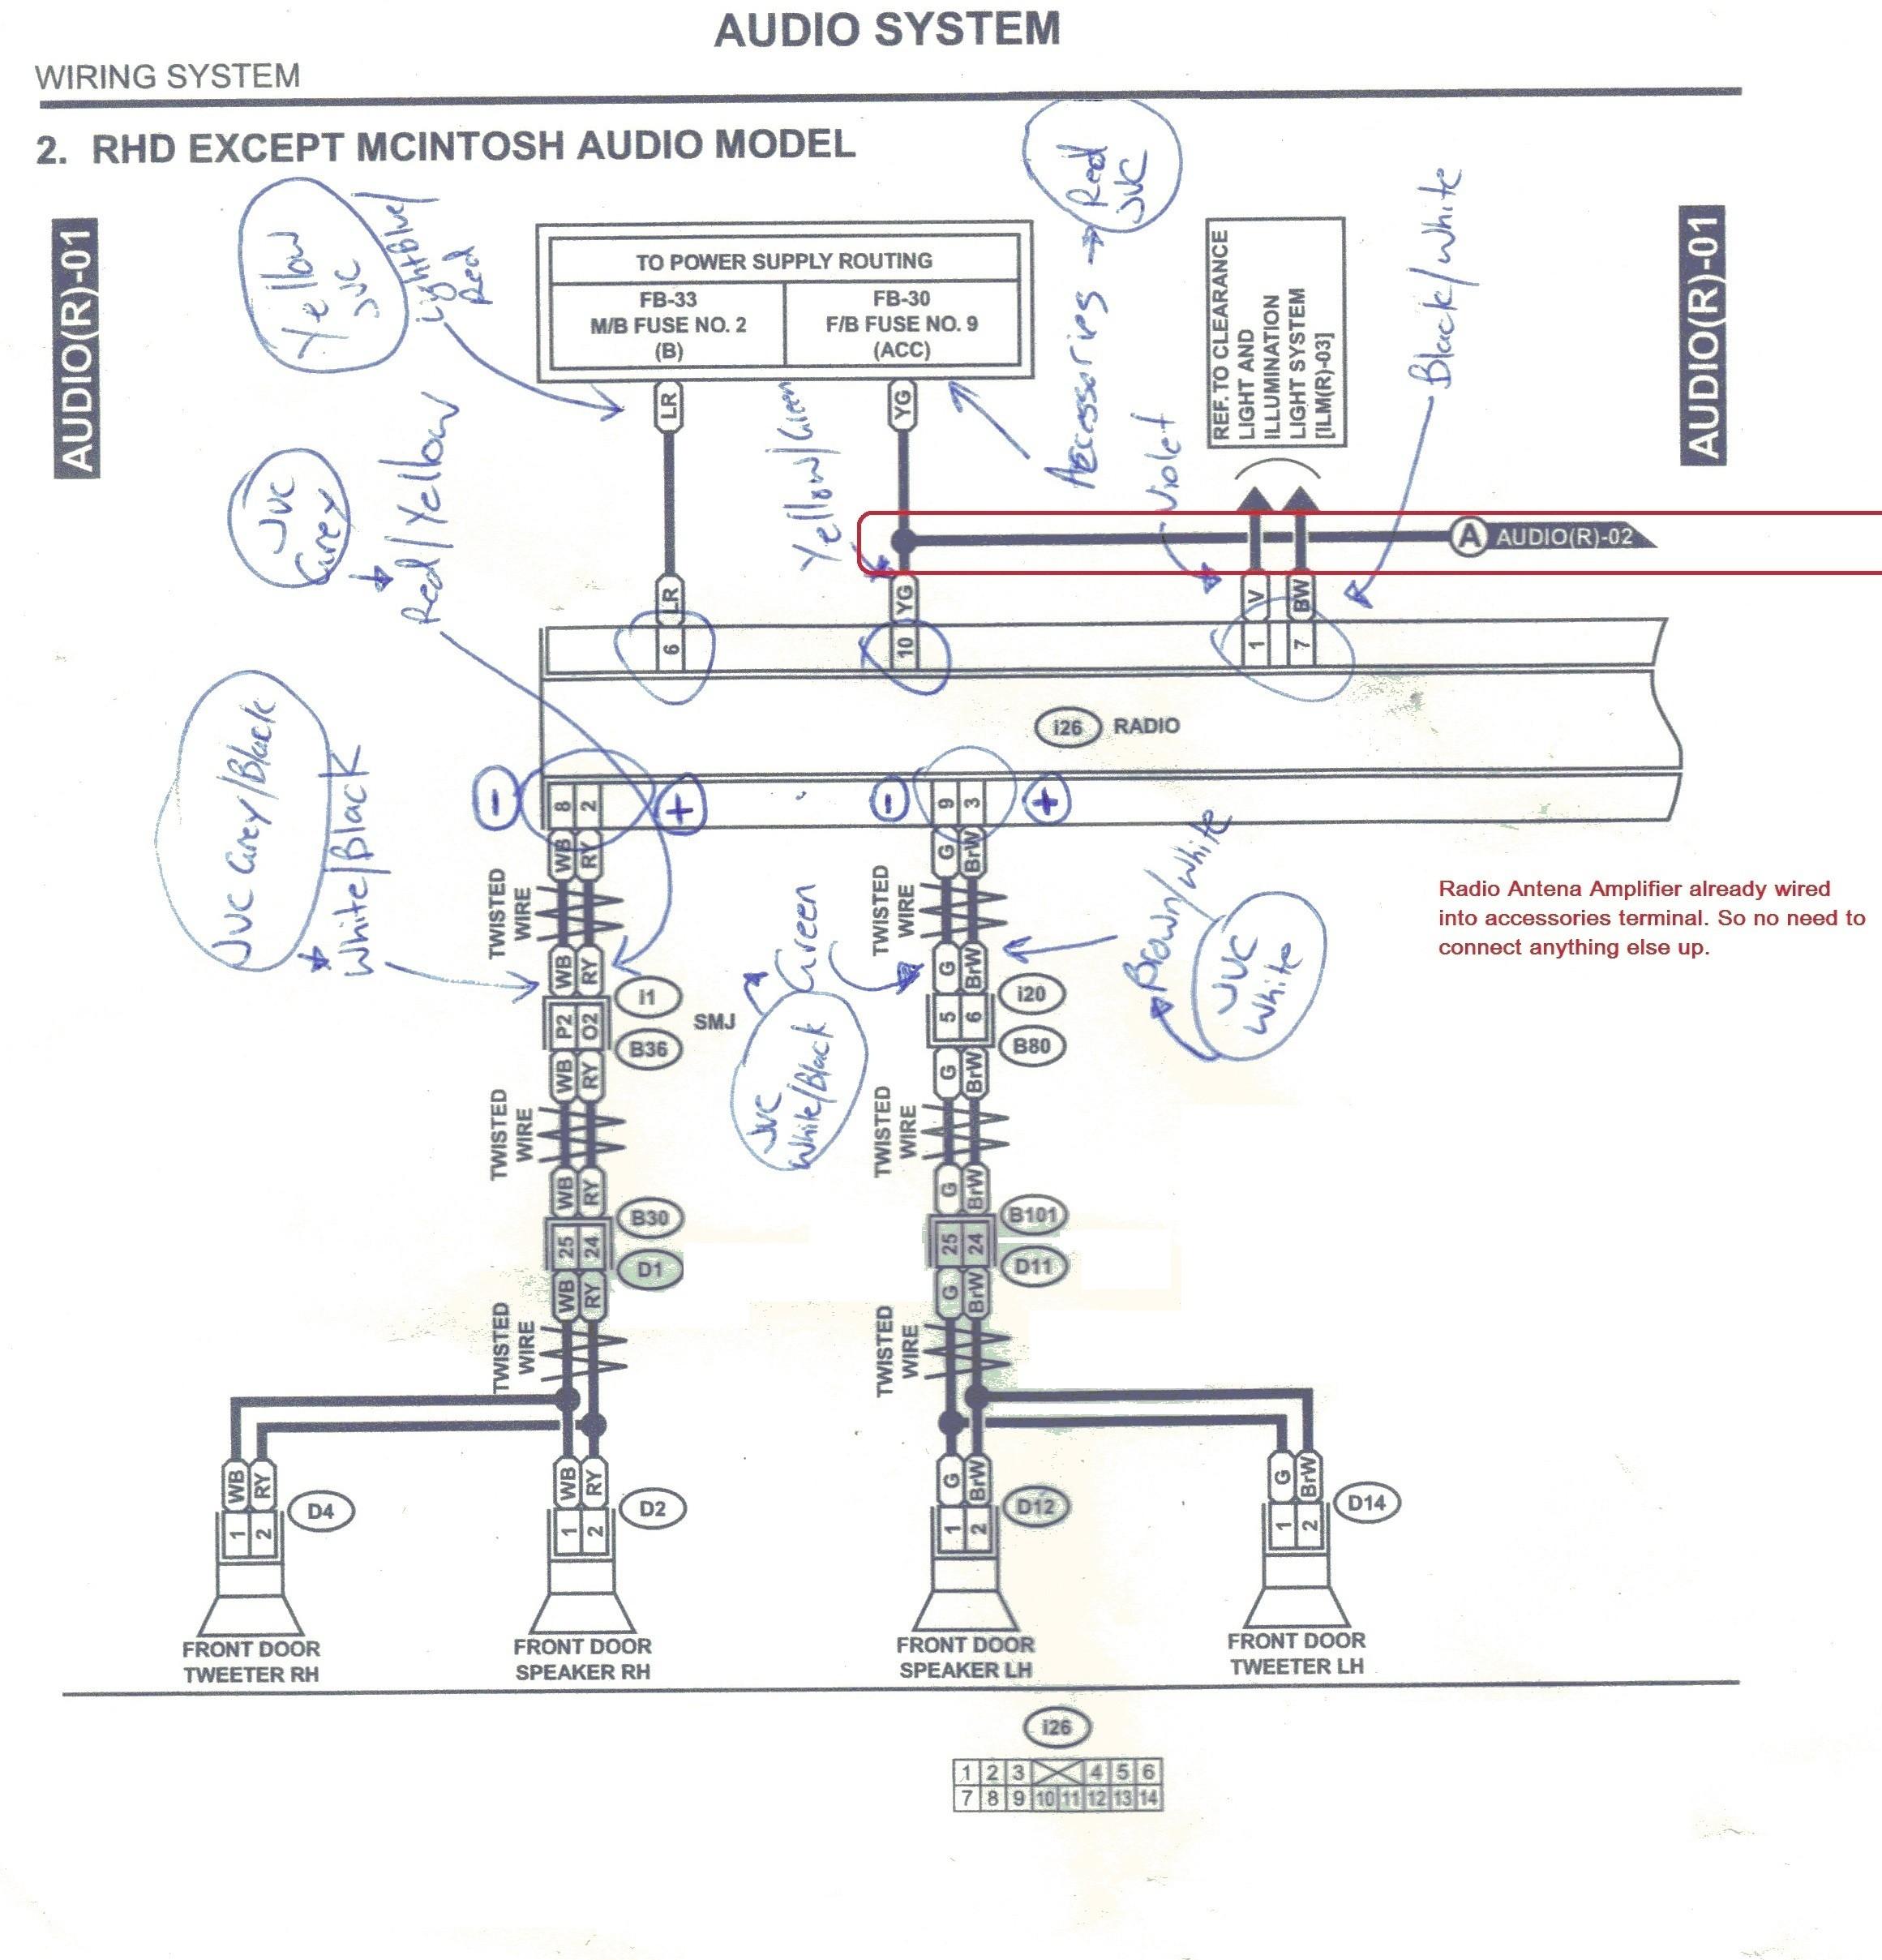 Subaru Legacy Engine Diagram 2 Subaru Legacy Fuse Box Diagram Also Subaru Evap System Diagram Of Subaru Legacy Engine Diagram 2